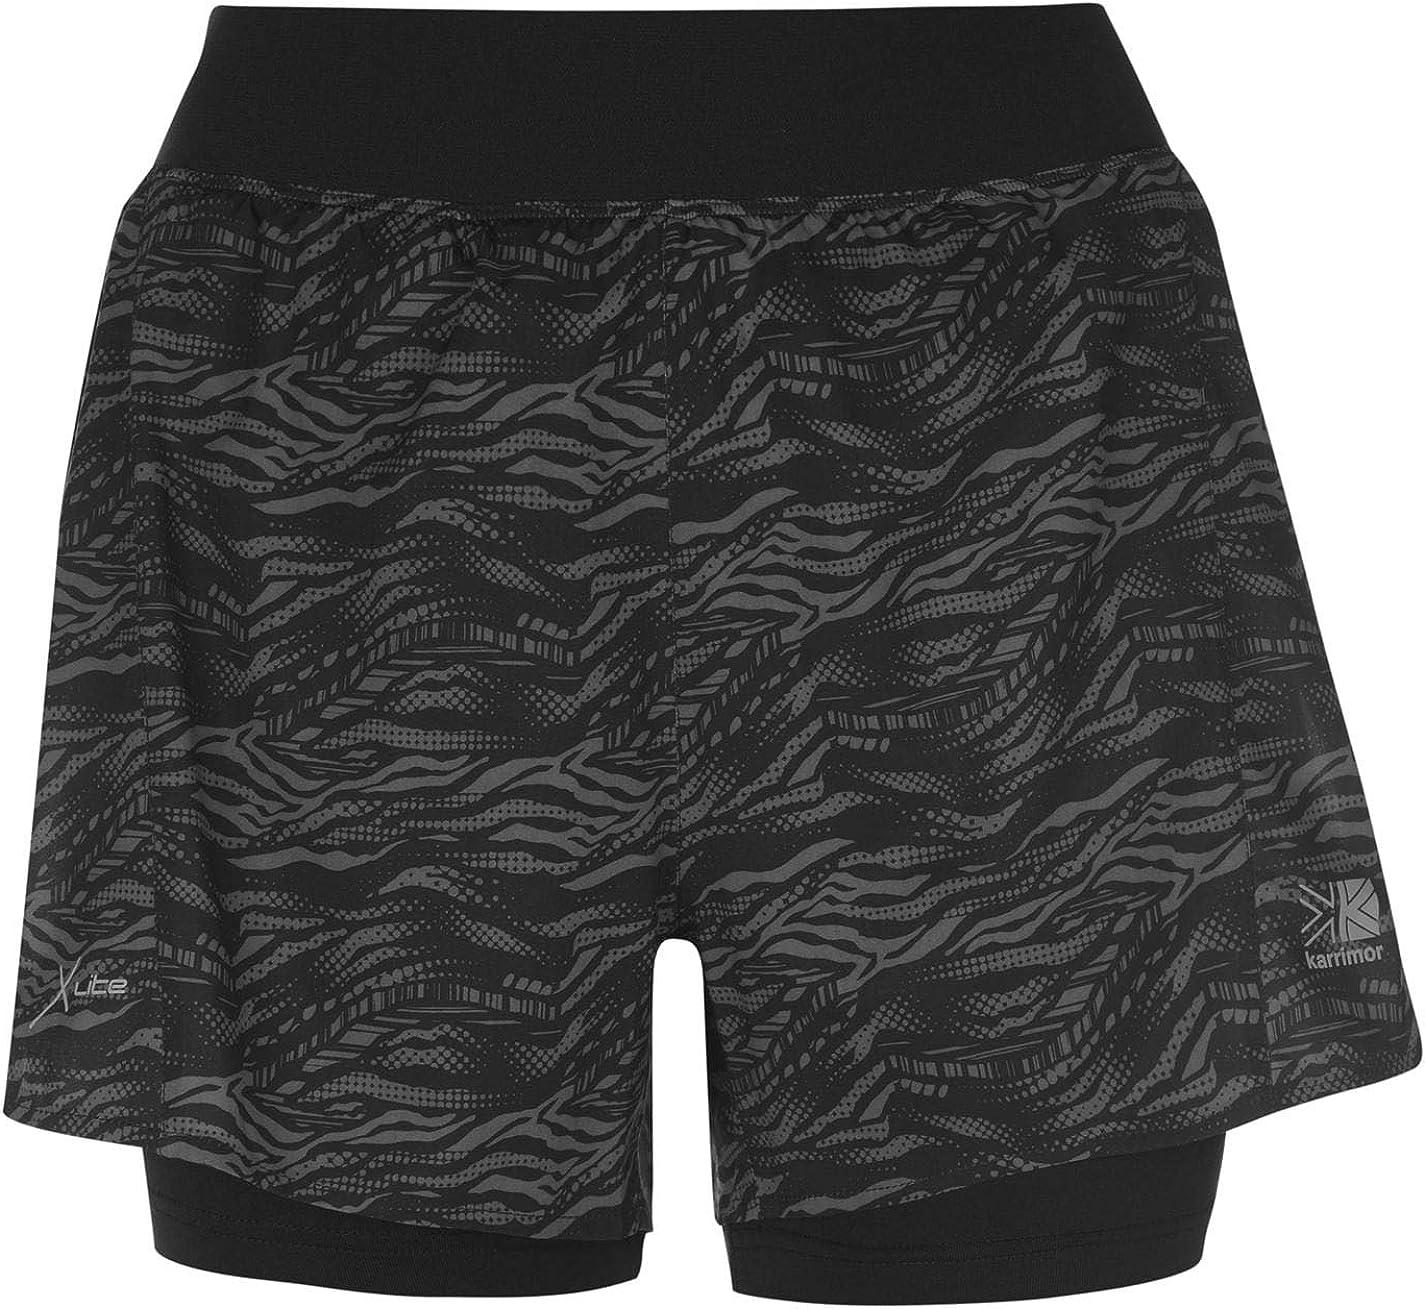 Karrimor Womens 2 Infants Shorts Performance Pants Trousers